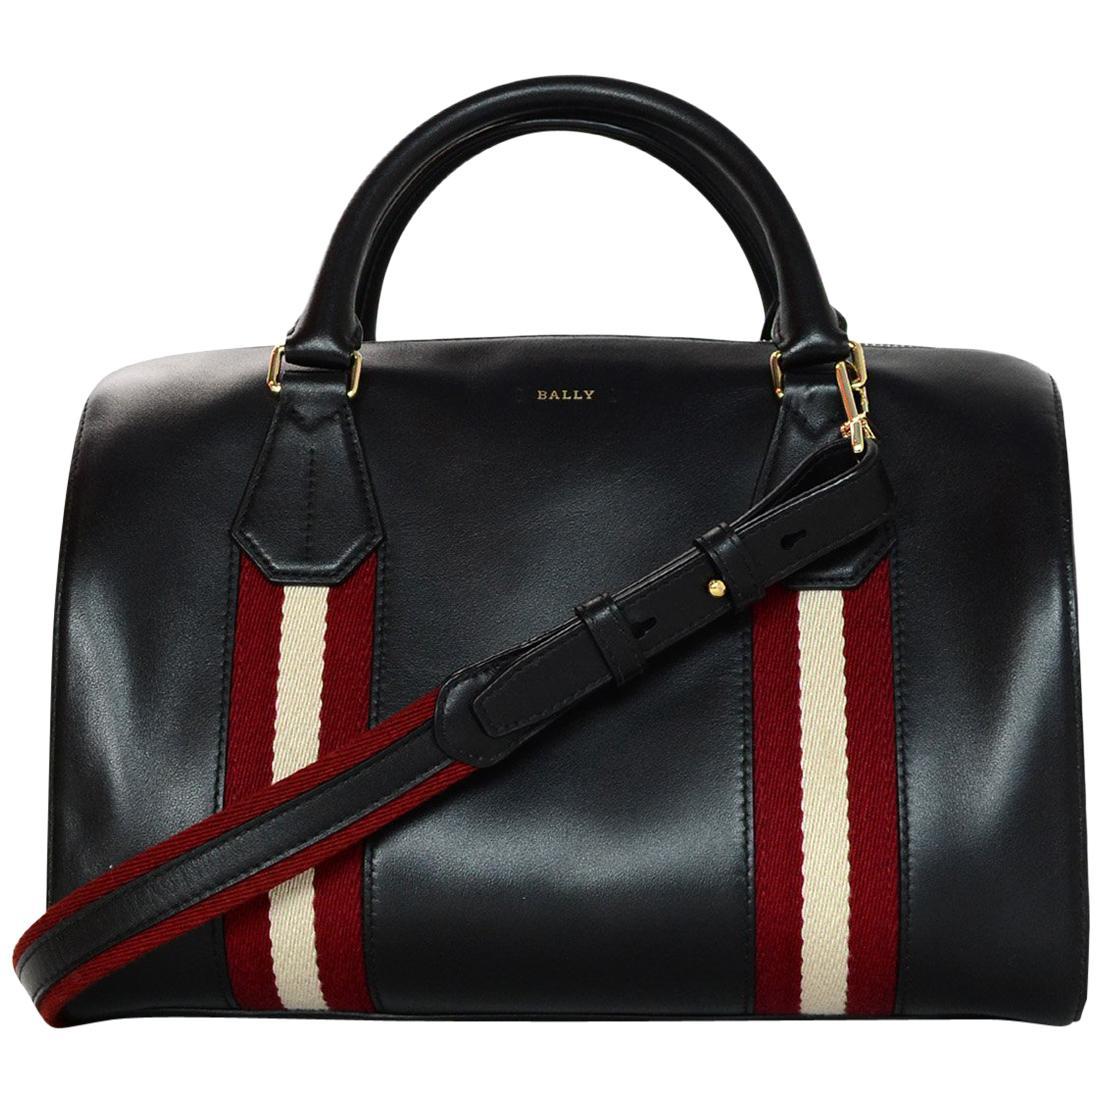 27cf2b657487 Prada Vintage Black Nylon Handbag with Dust Bag For Sale at 1stdibs